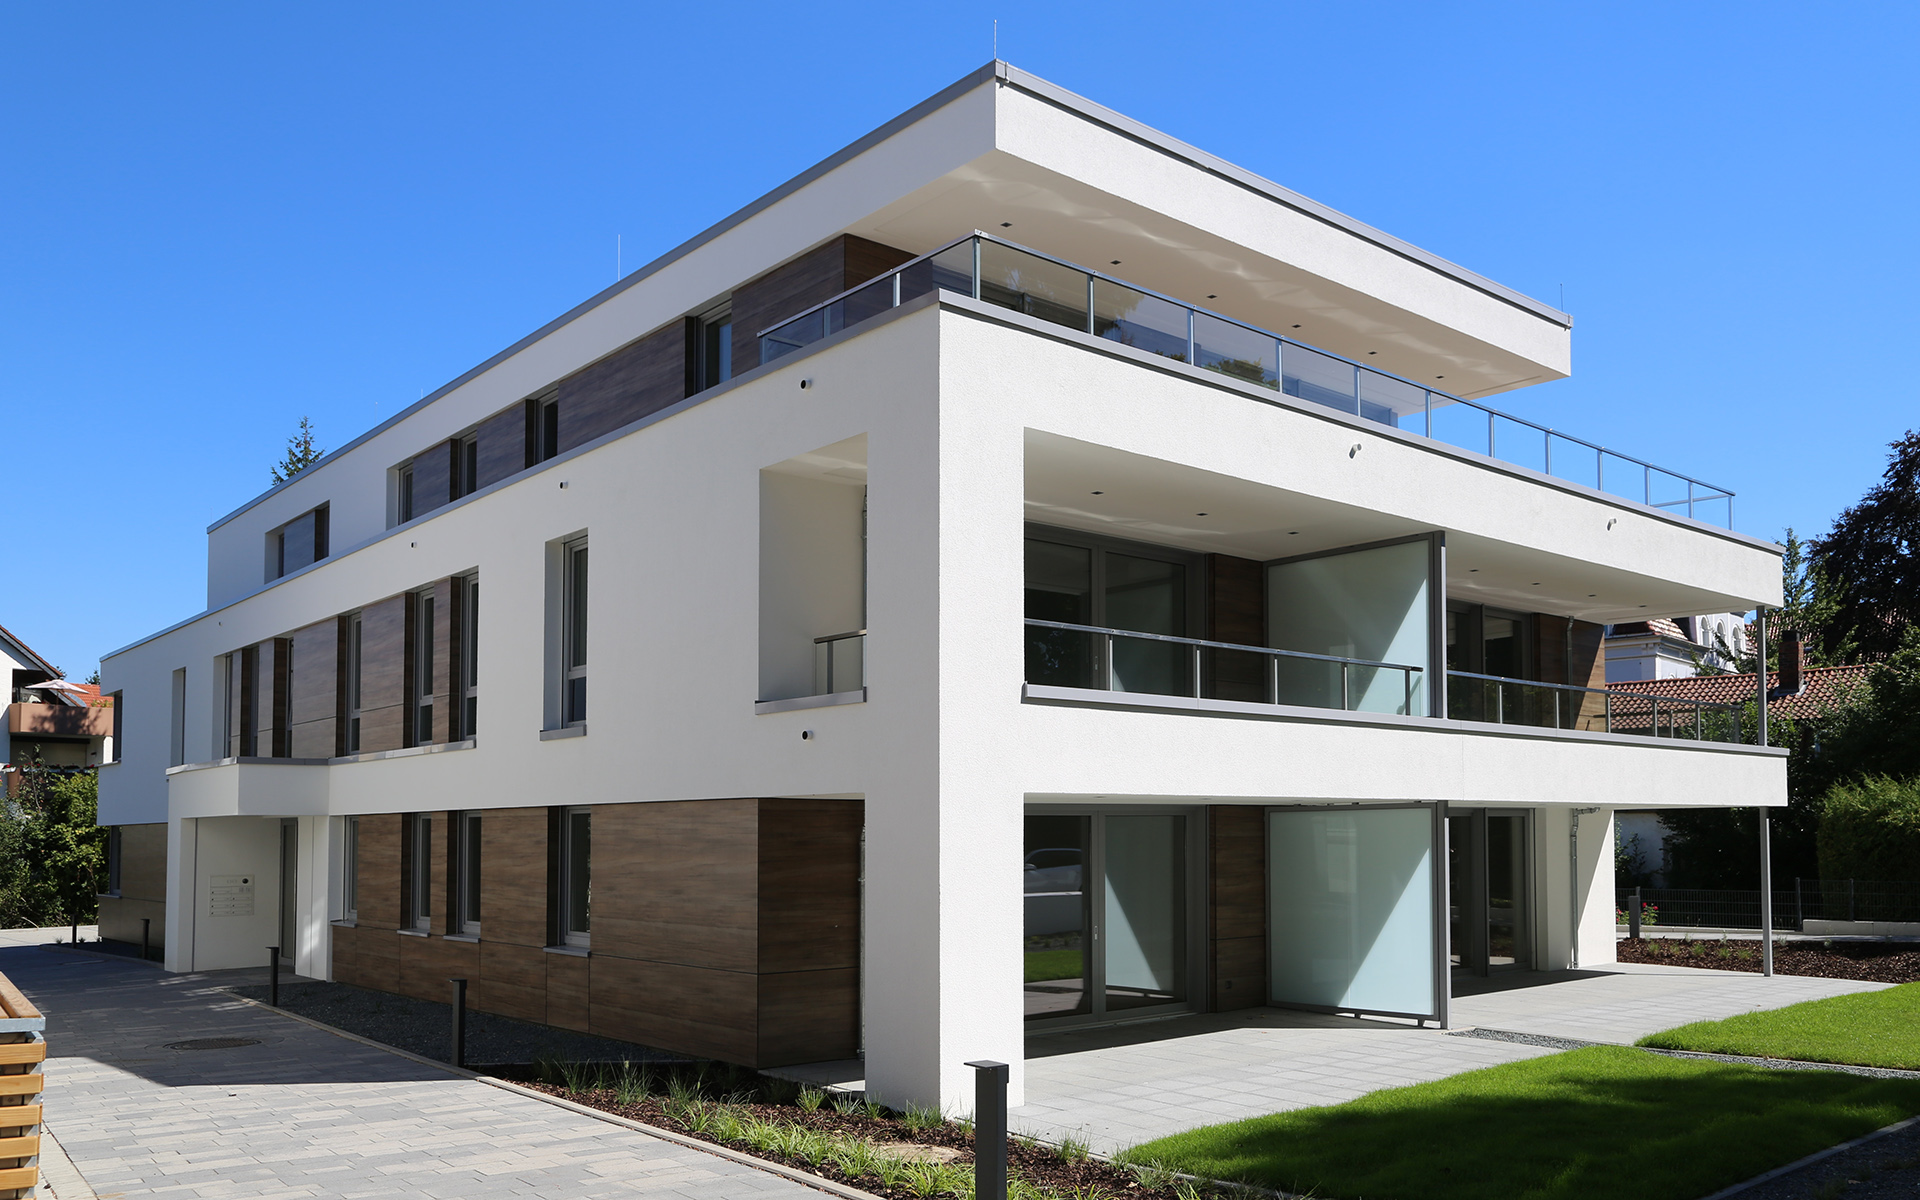 bwv grosse venedig jung architekturb ro innenarchitekturb ro hildesheim. Black Bedroom Furniture Sets. Home Design Ideas